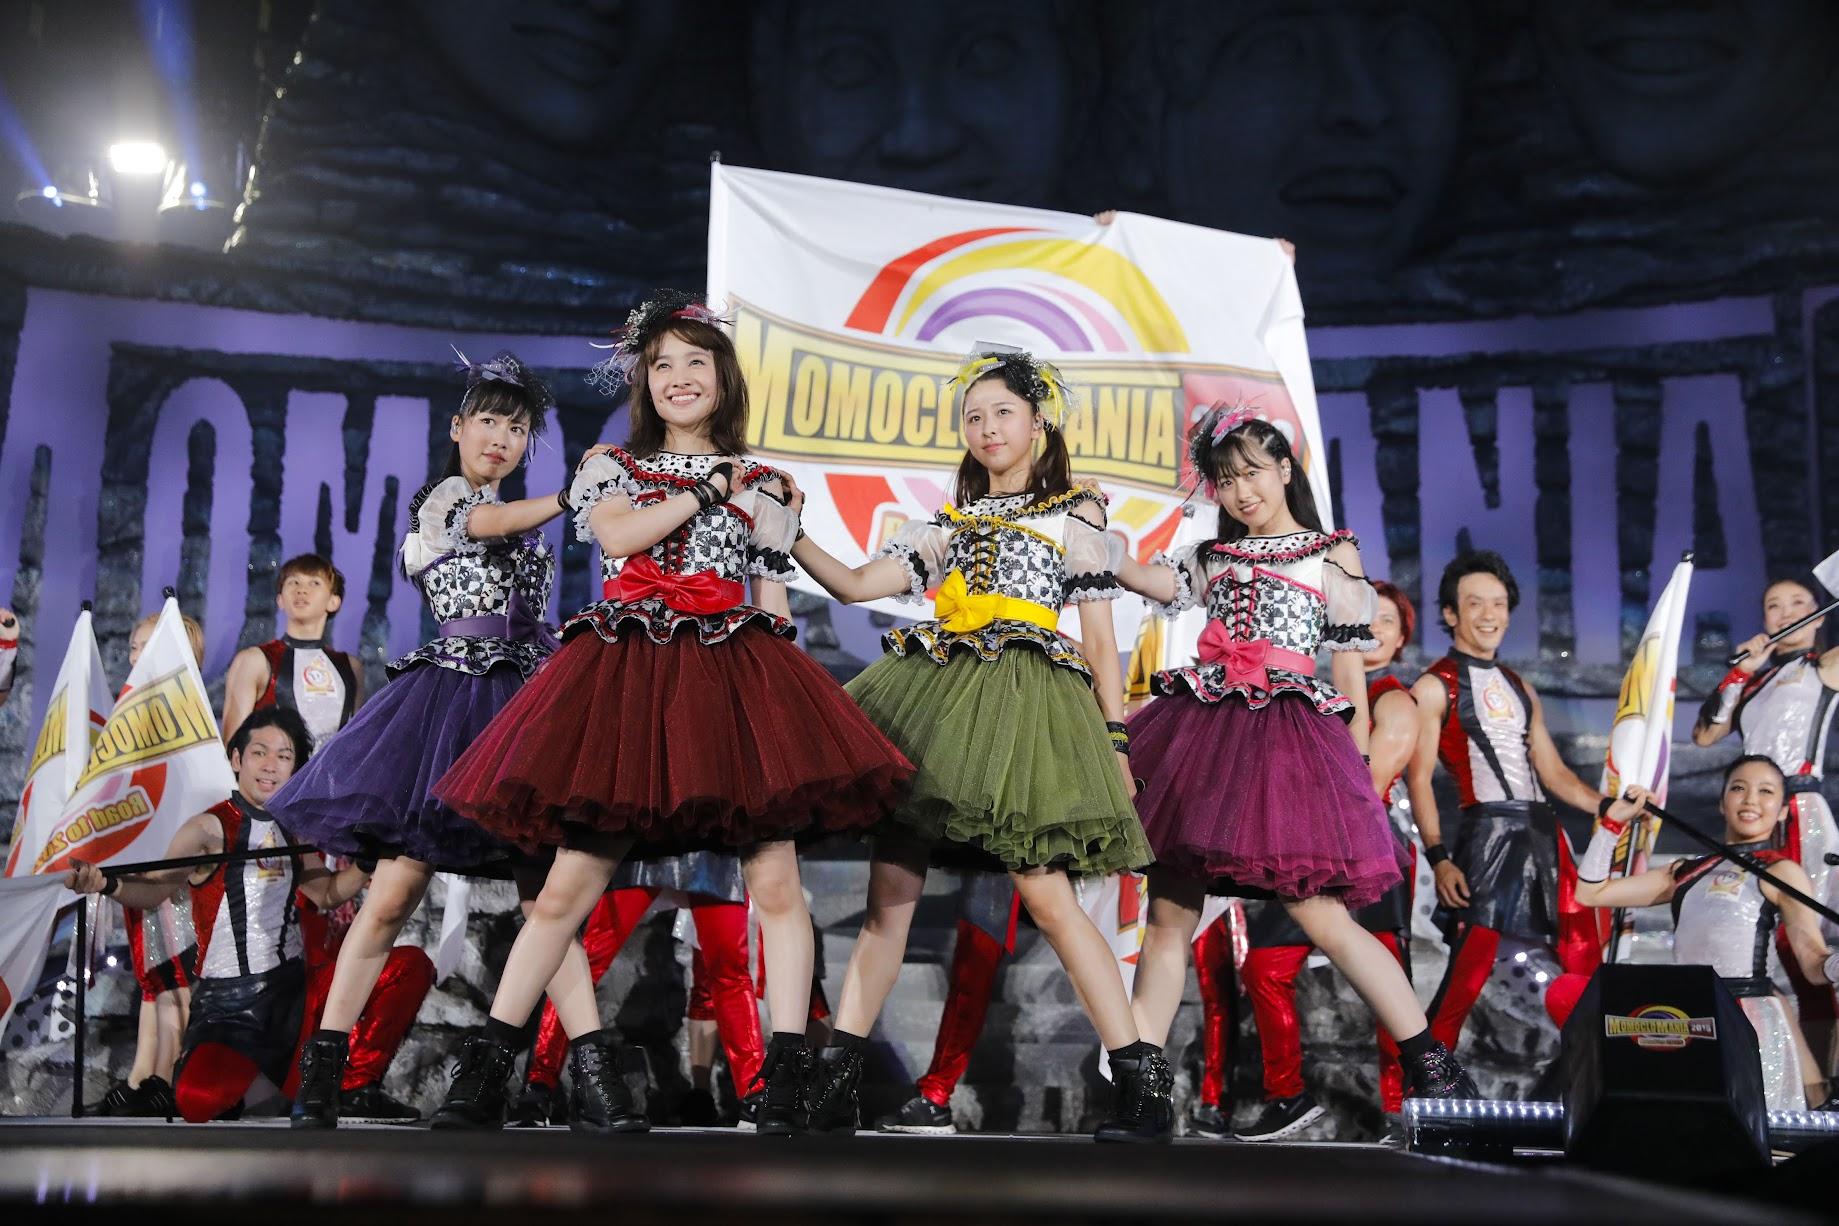 【迷迷專訪】桃色幸運草Z  ももいろクローバーZ )台灣演唱會前訪問 邀請粉絲到場共創最棒的回憶